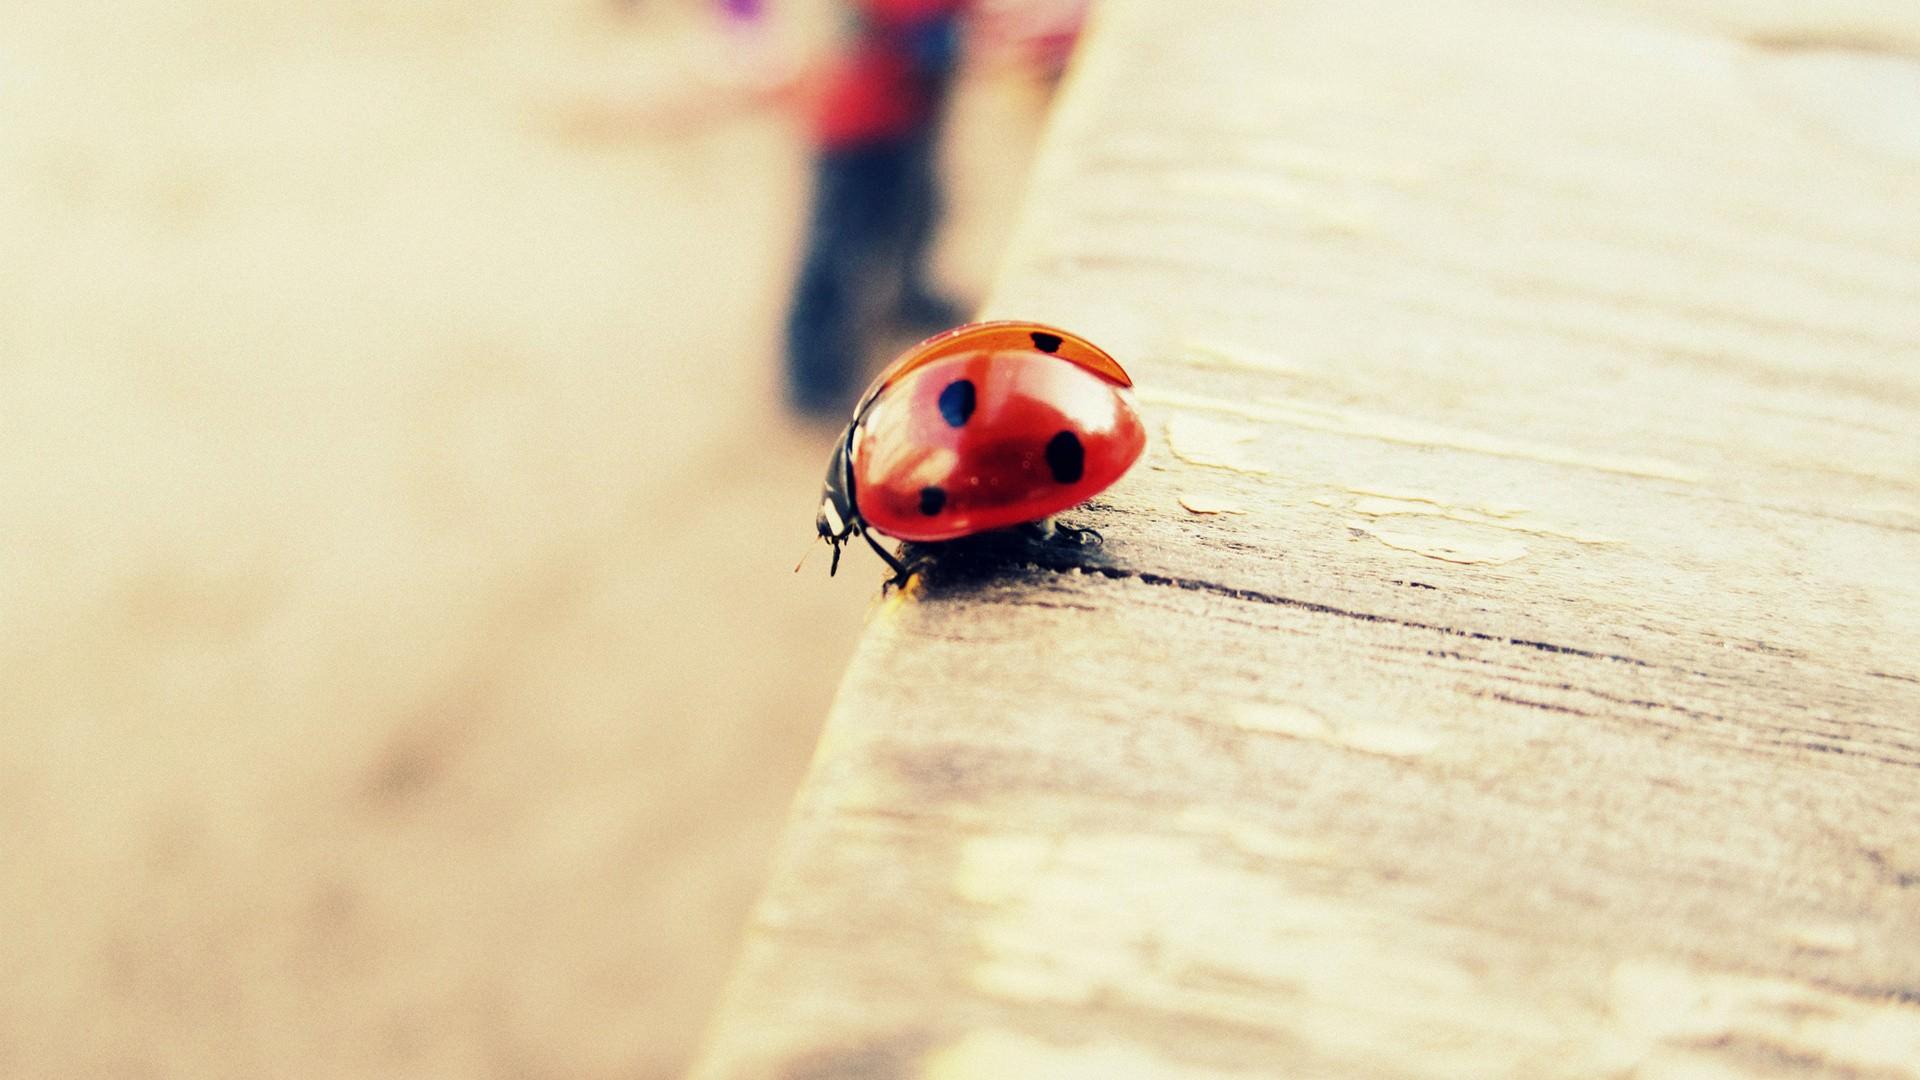 Ladybug Wallpaper For Free